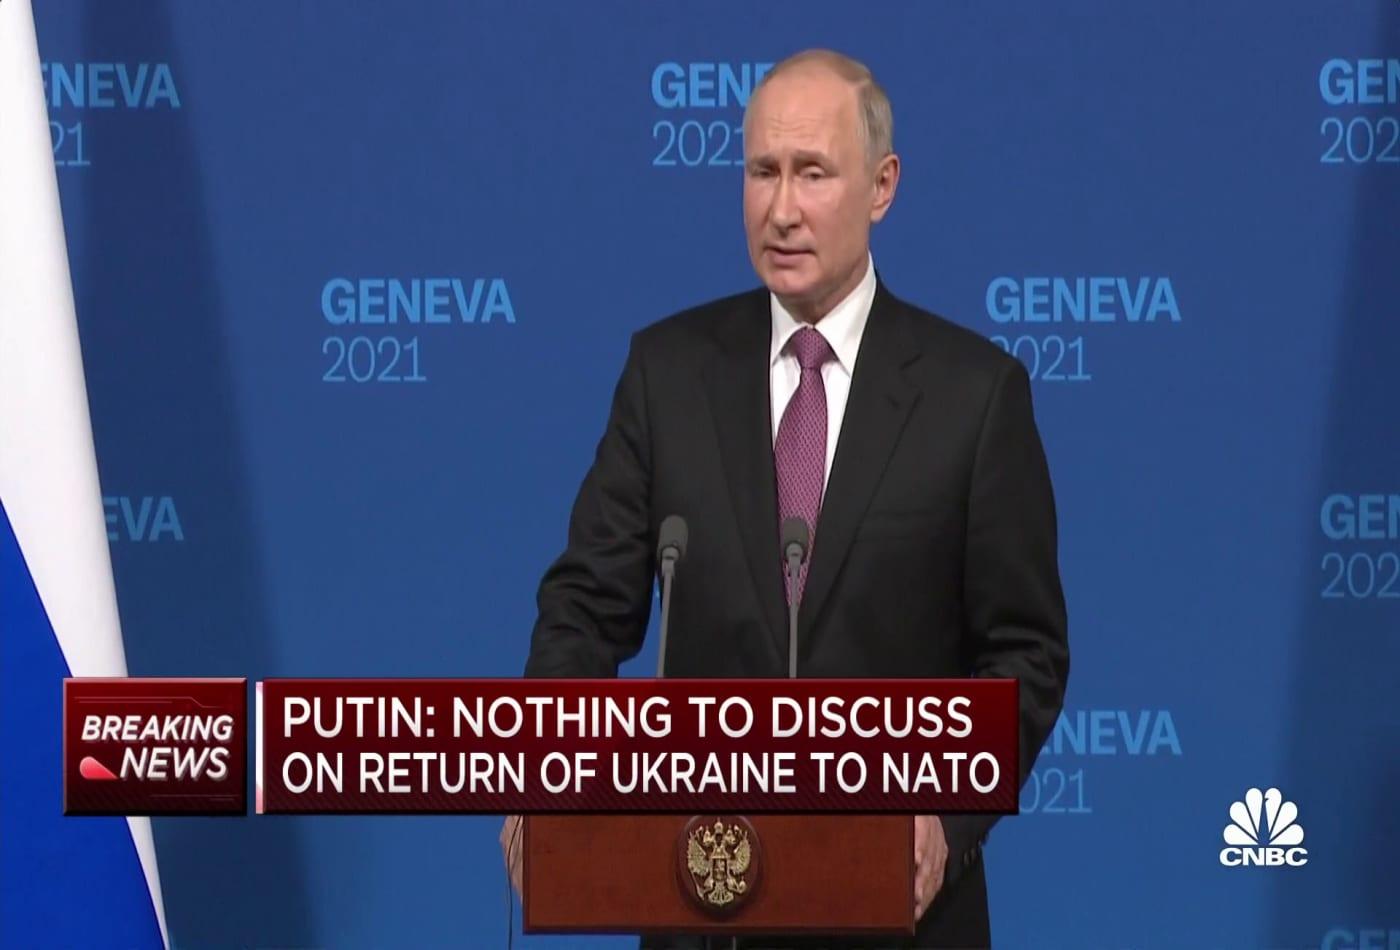 Vladimir Putin delivers remarks after meeting with President Biden